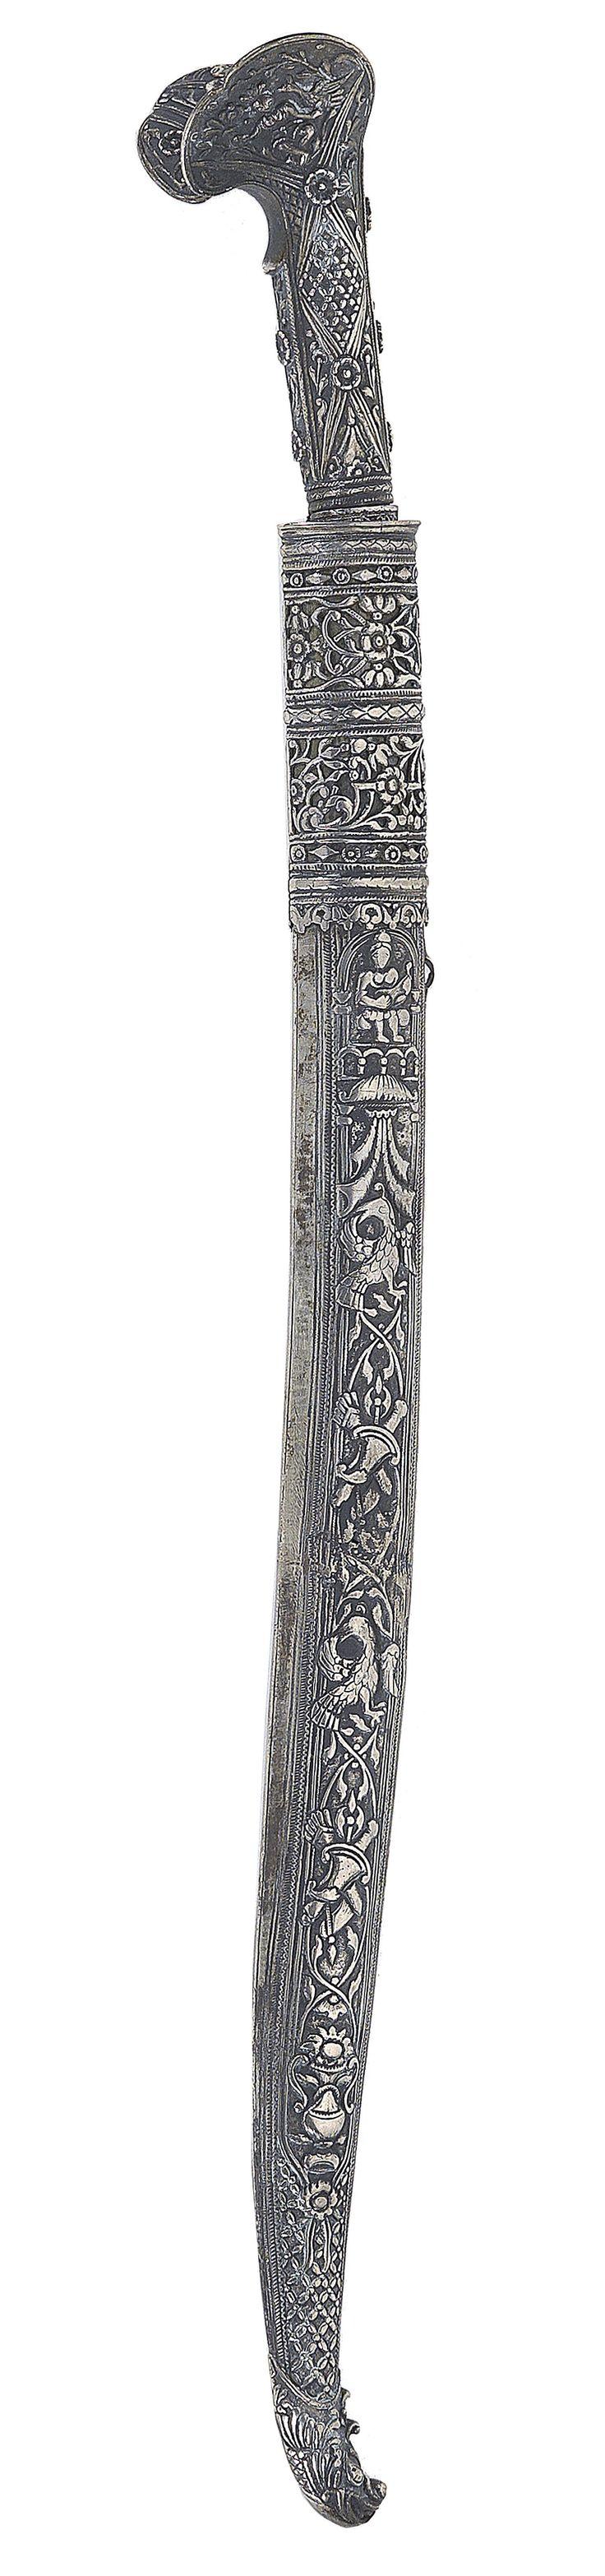 Silver Yataghan, Ioannina,1st half of 19th Century